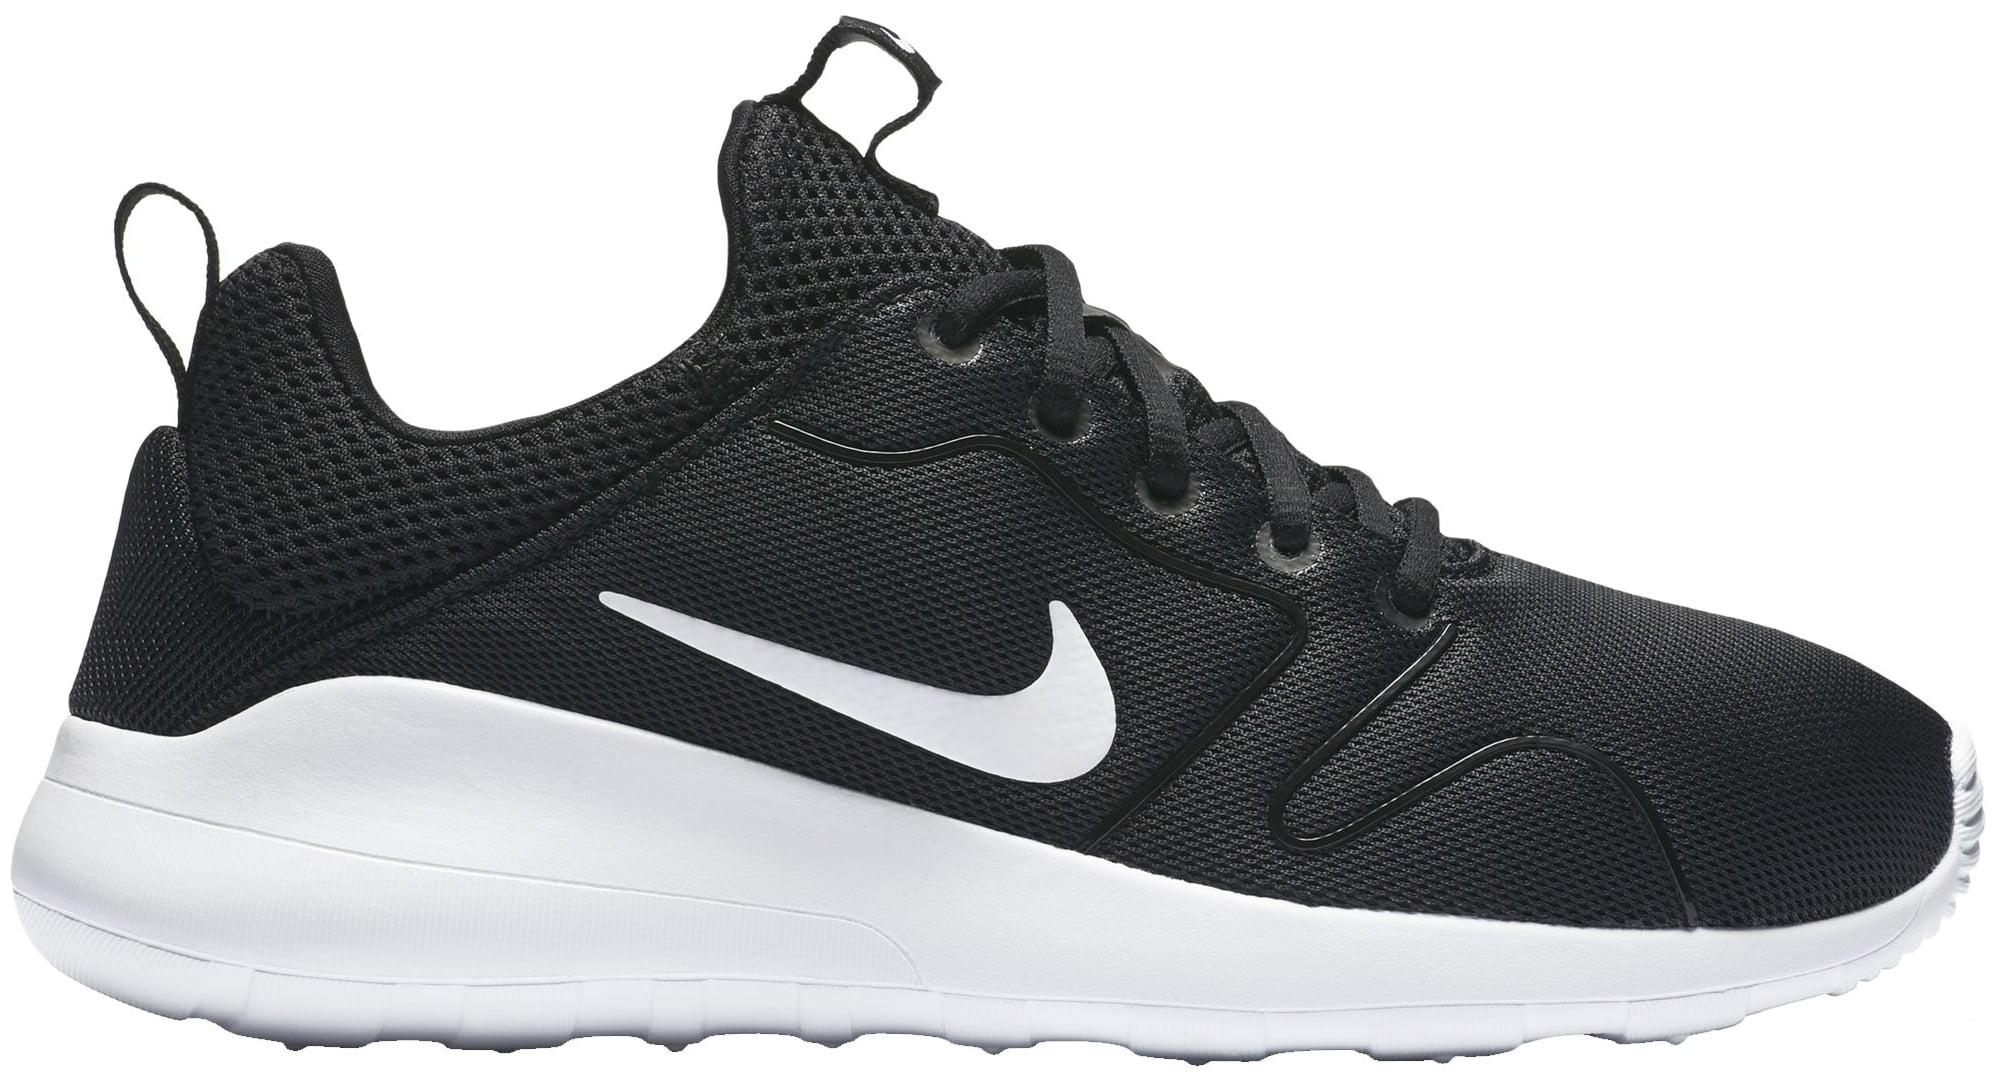 hot sale online c93b0 5d580 ... cheapest nike womens kaishi 2.0 shoes black white 9.5 walmart 950eb  67983